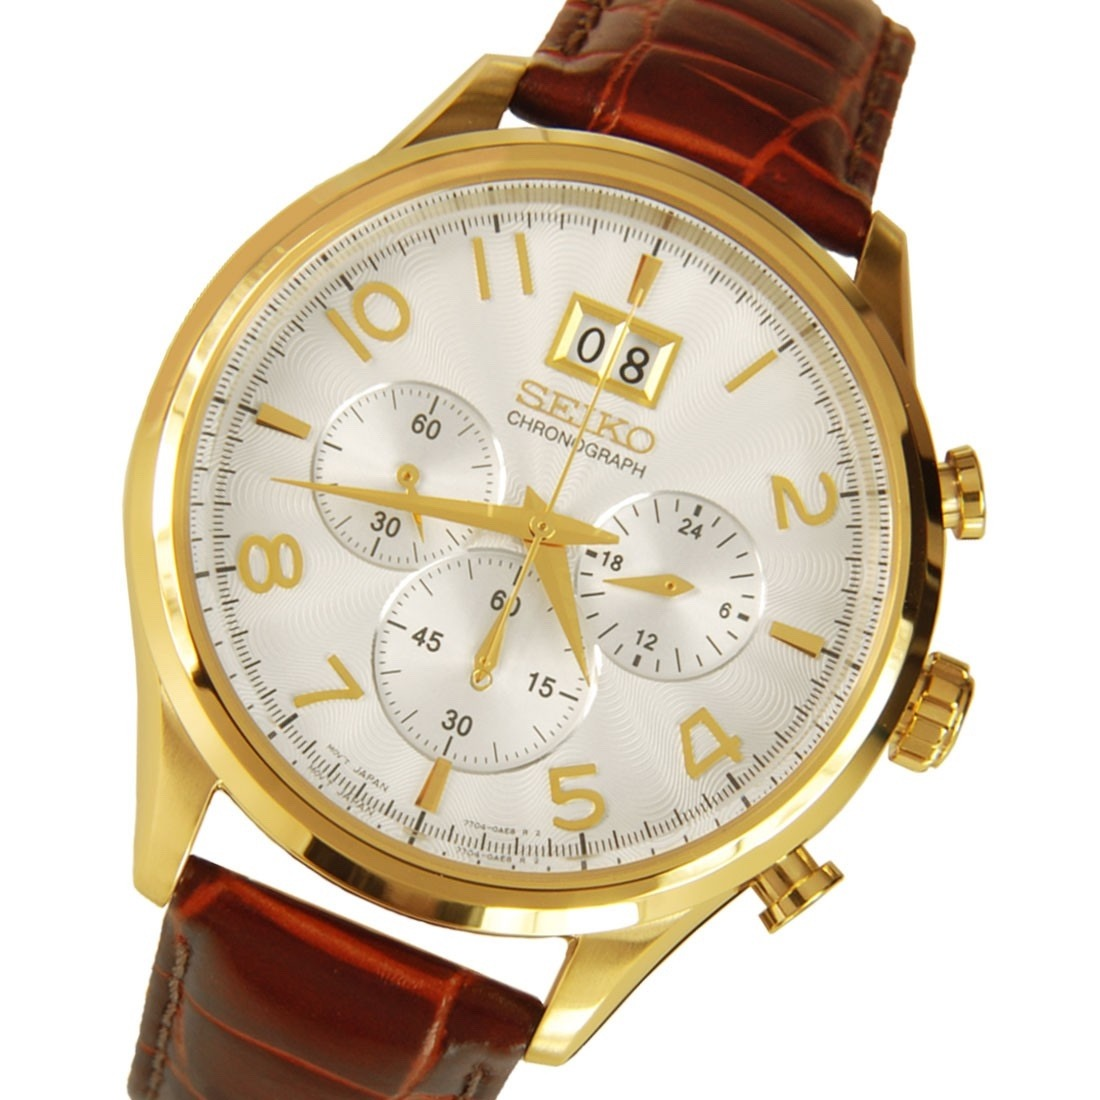 f8a95d9708b Relógio Seiko Spc088p1 Masculino Cronografo Couro Dourado - R  1.879 ...